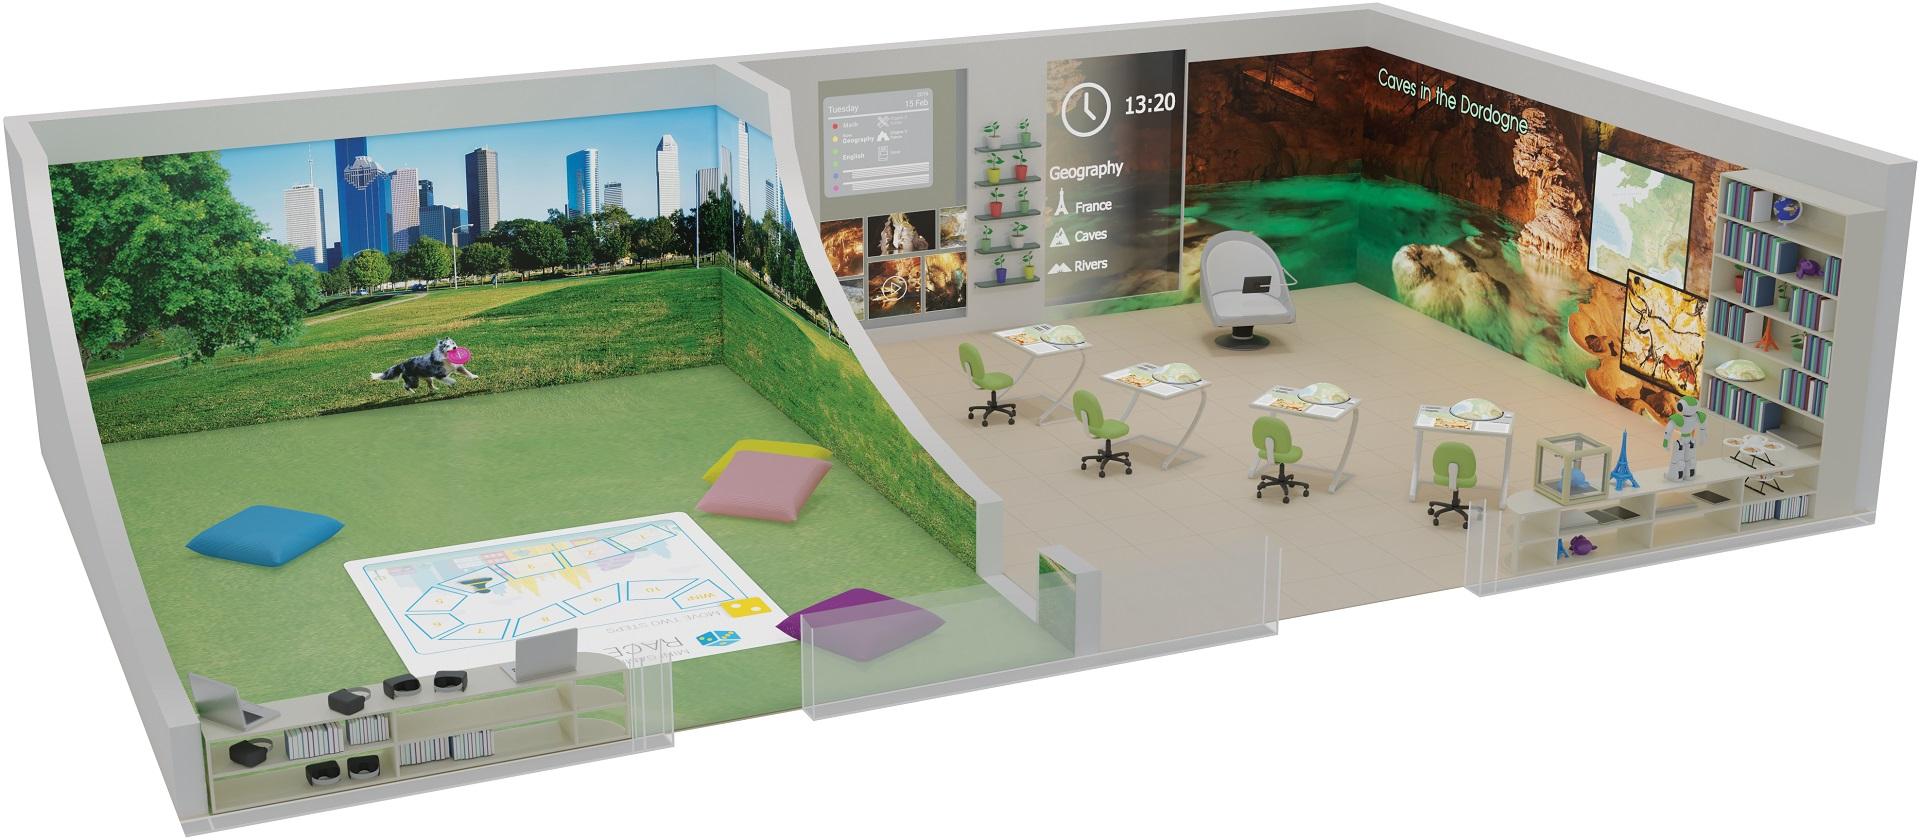 3D representation of the Intelligent Classroom